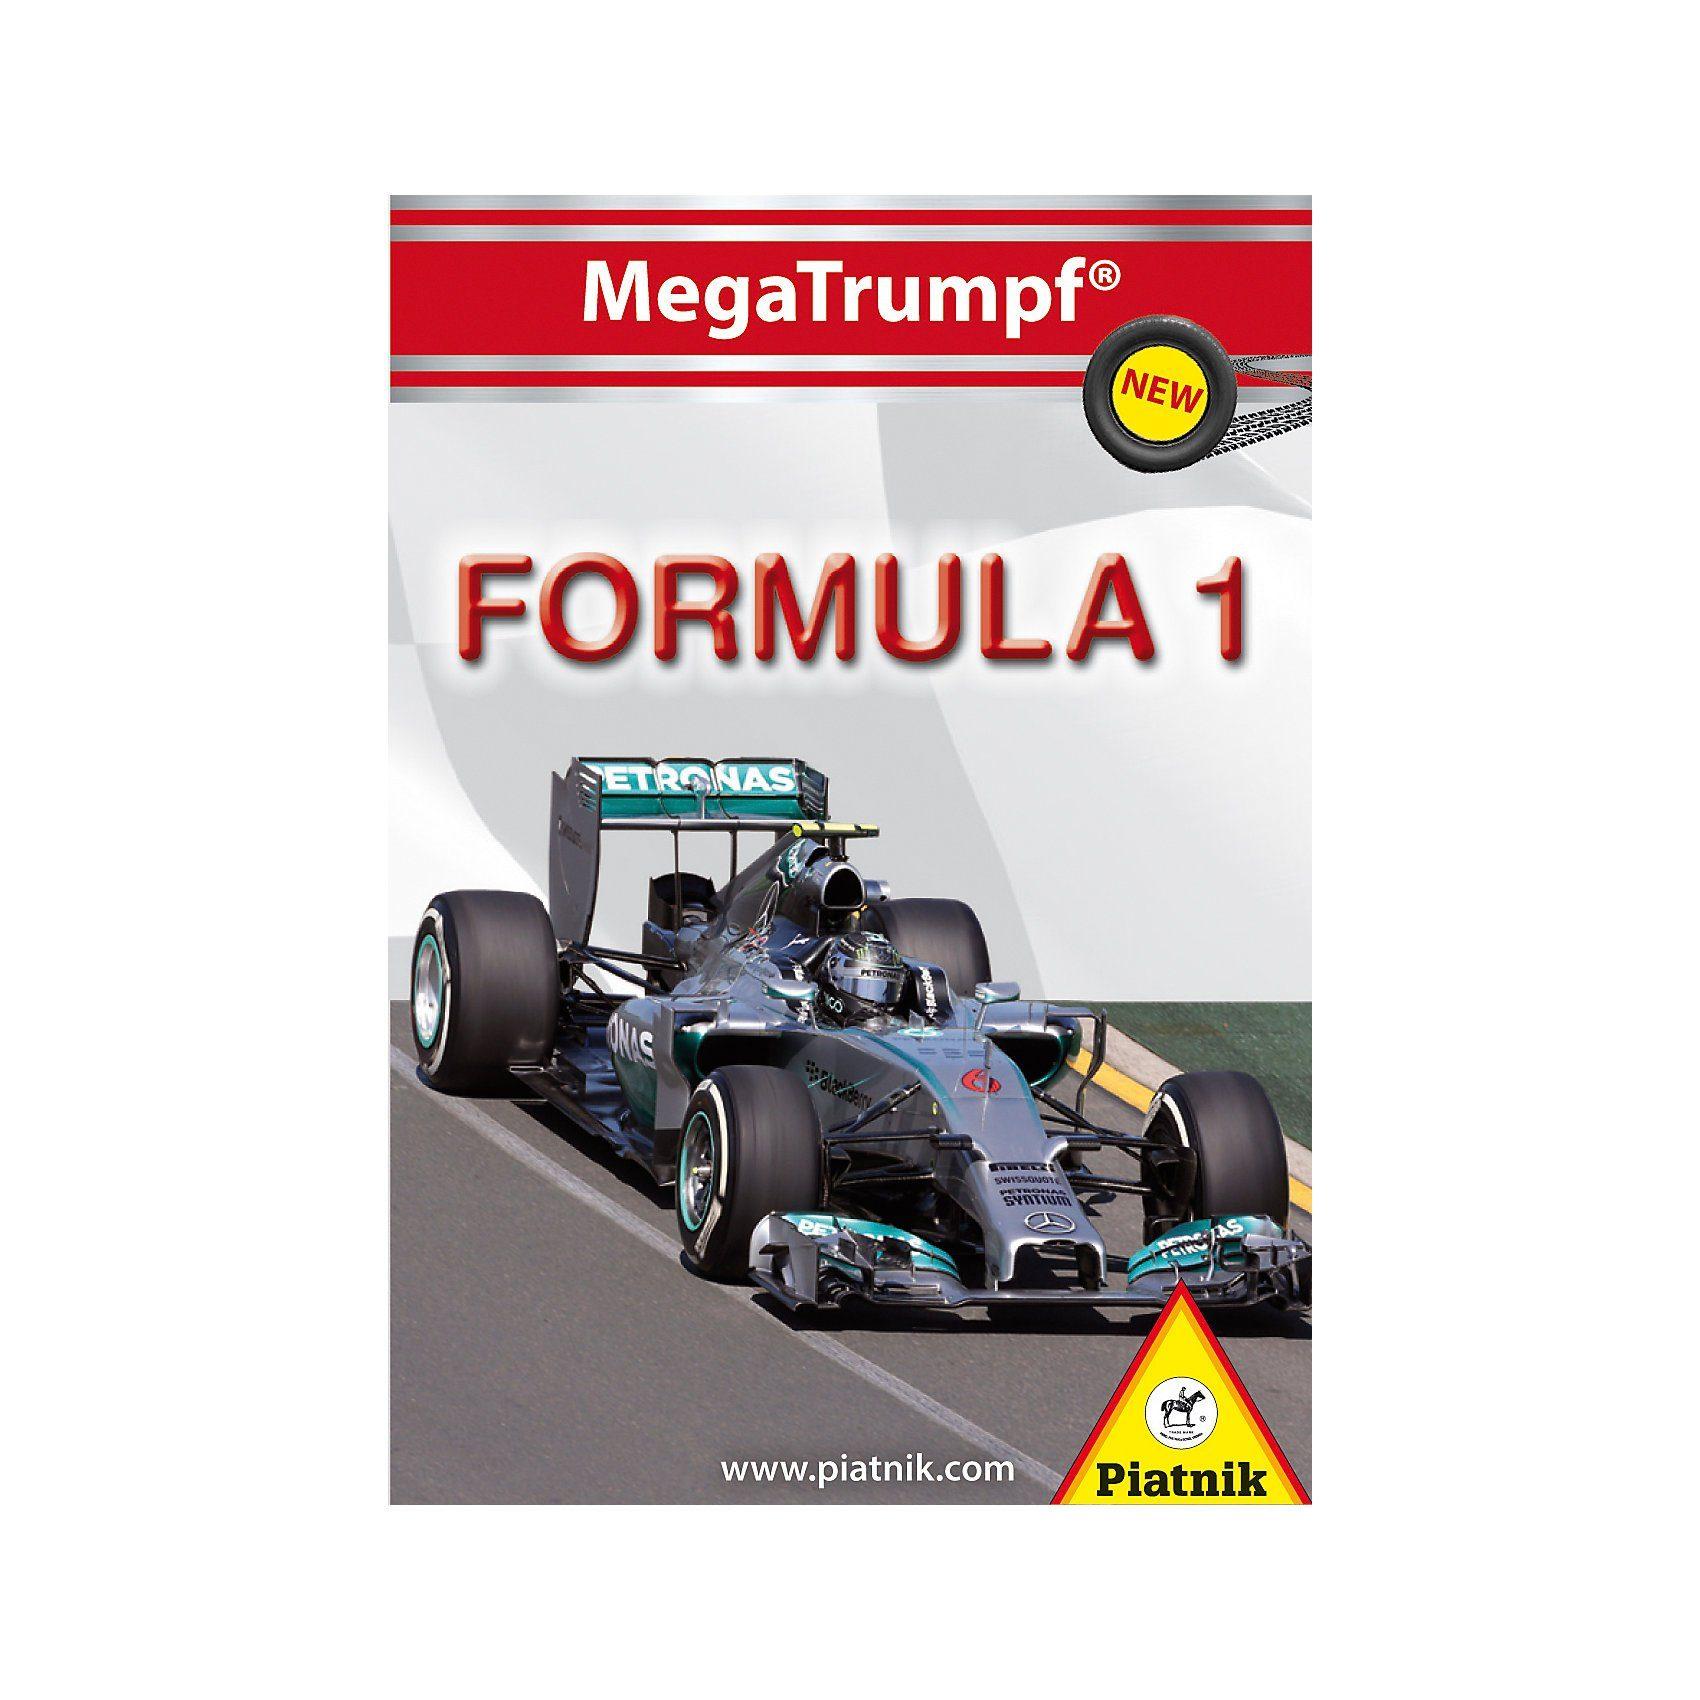 Piatnik Quartett Formel 1